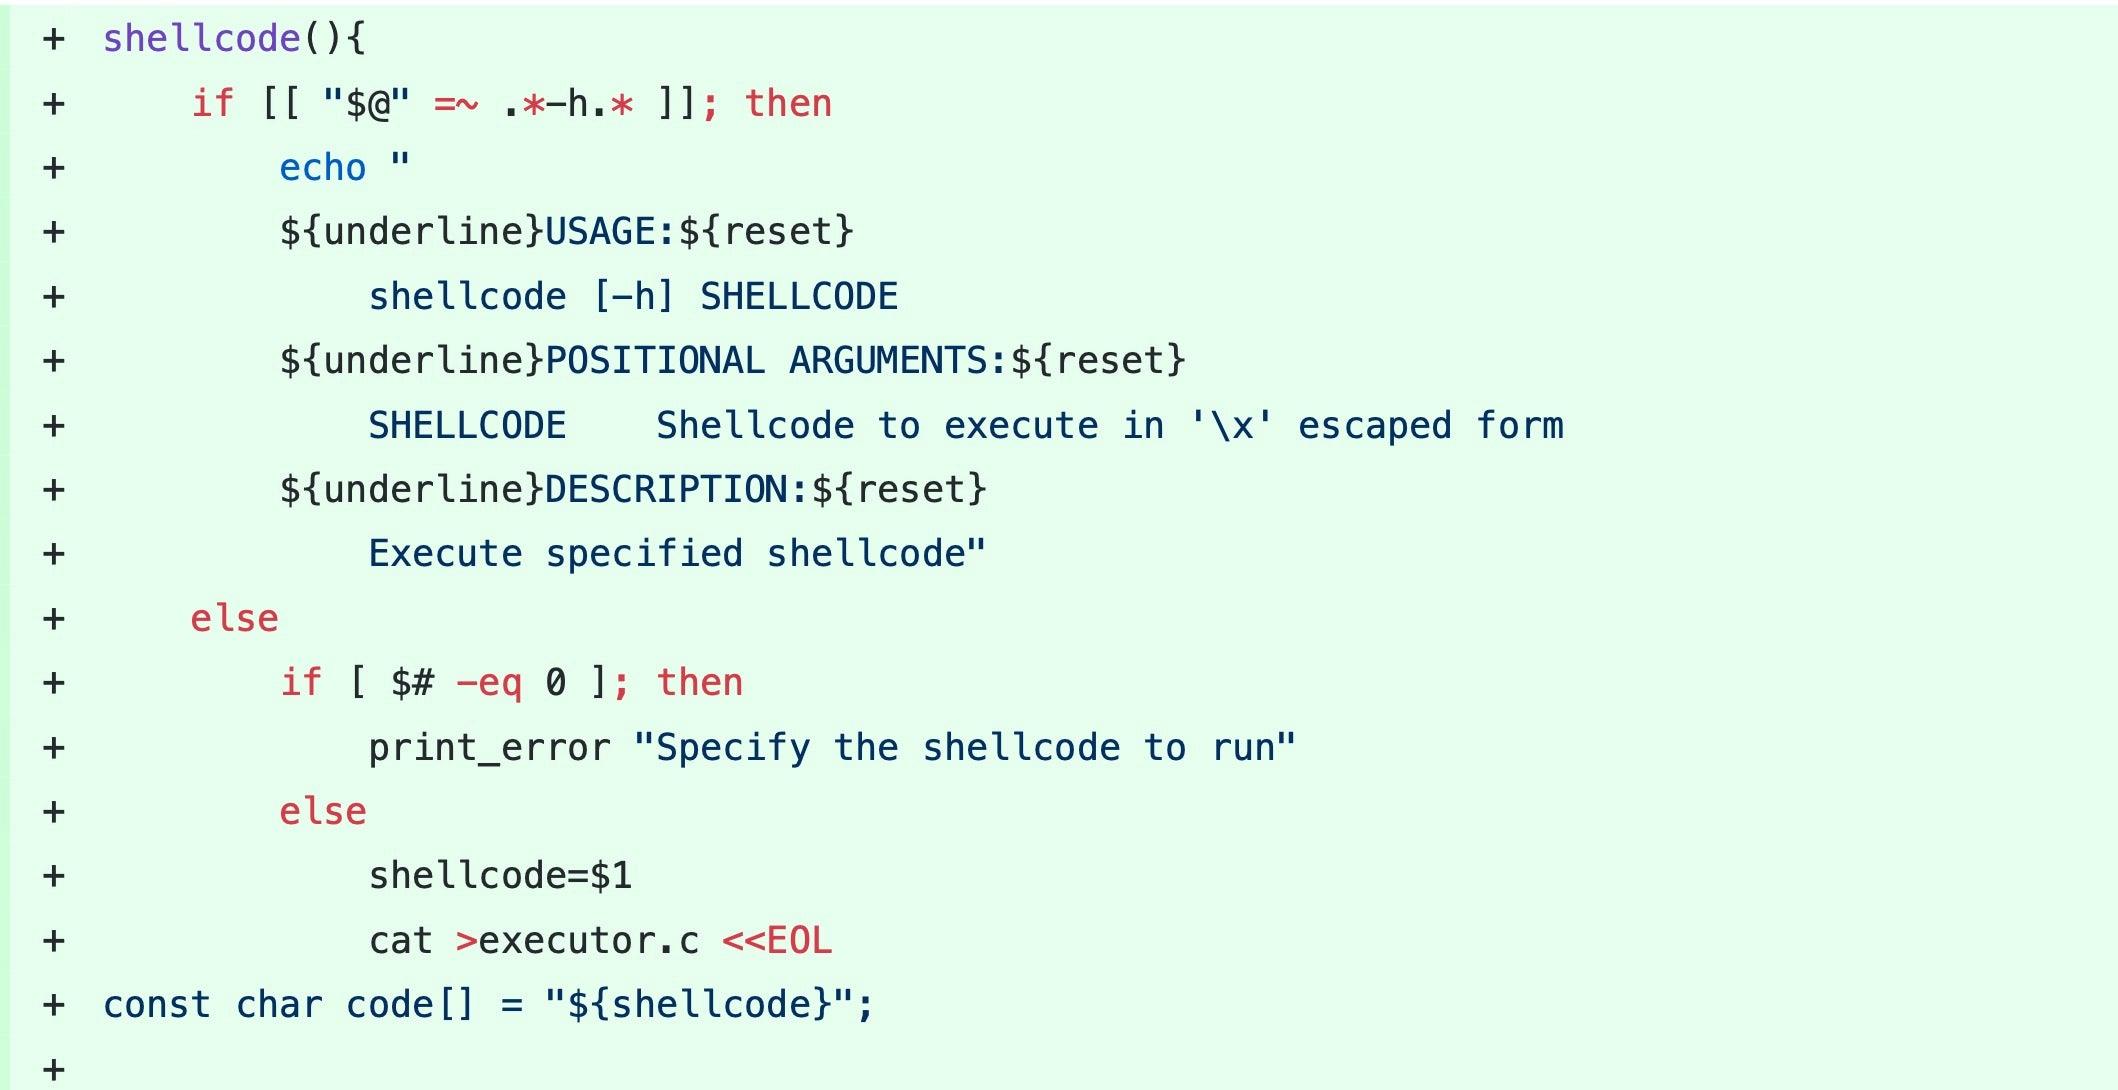 image of shellcode function